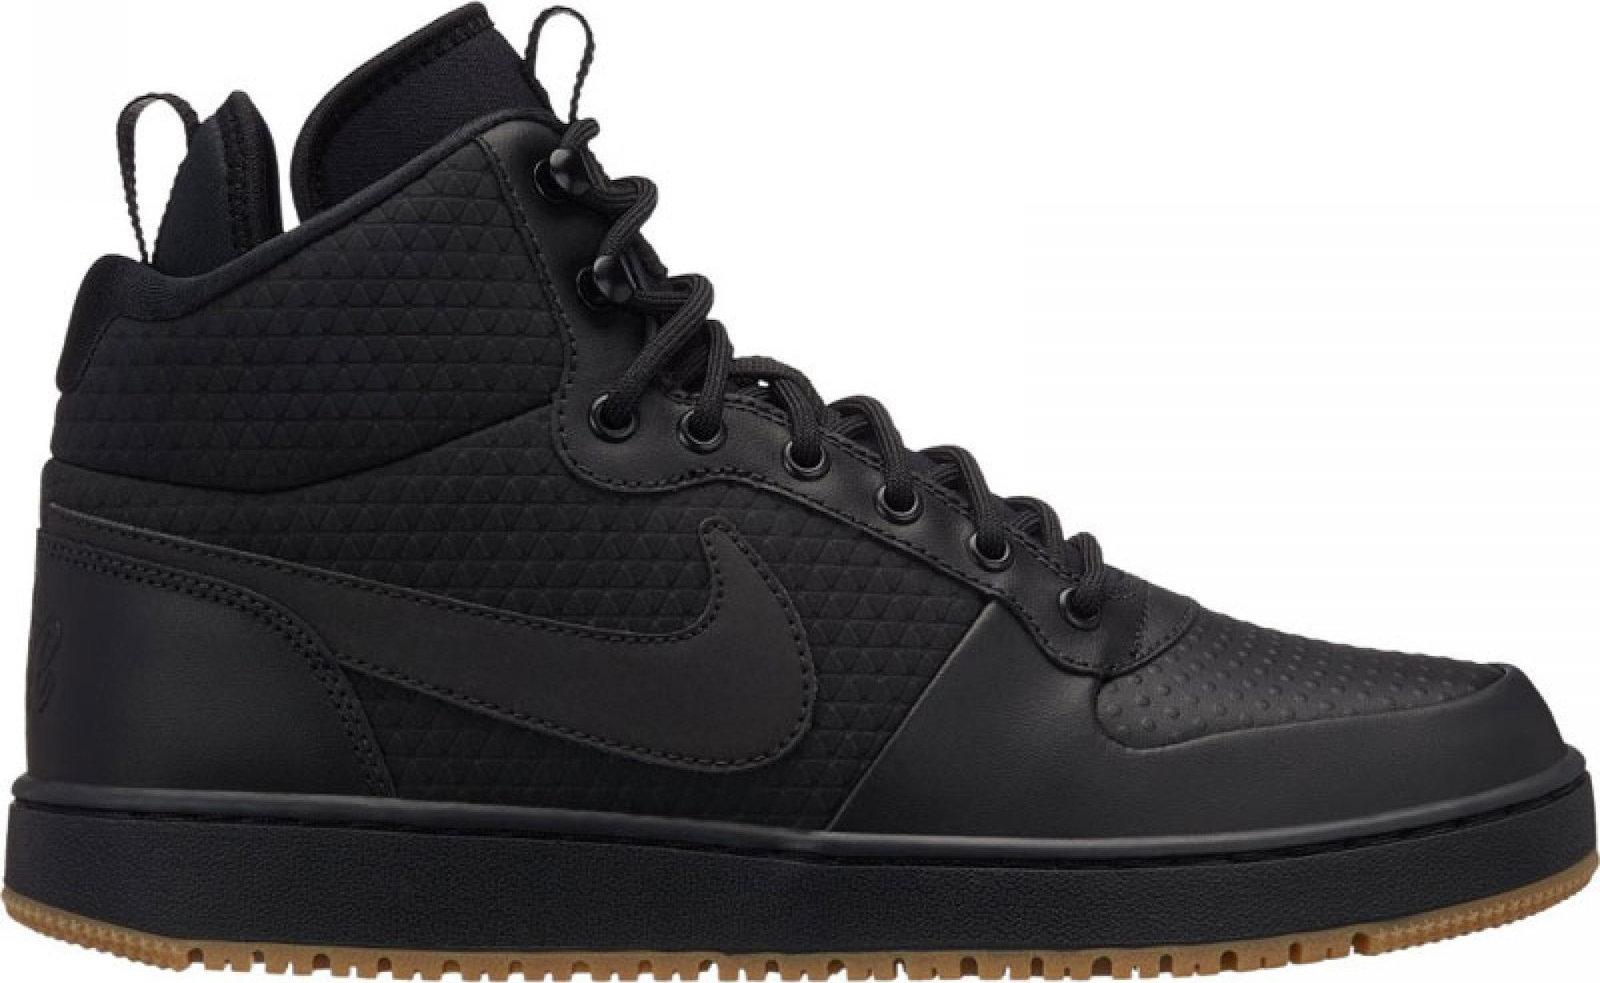 335905fae52 Προσθήκη στα αγαπημένα menu Nike Ebernon Mid Winter